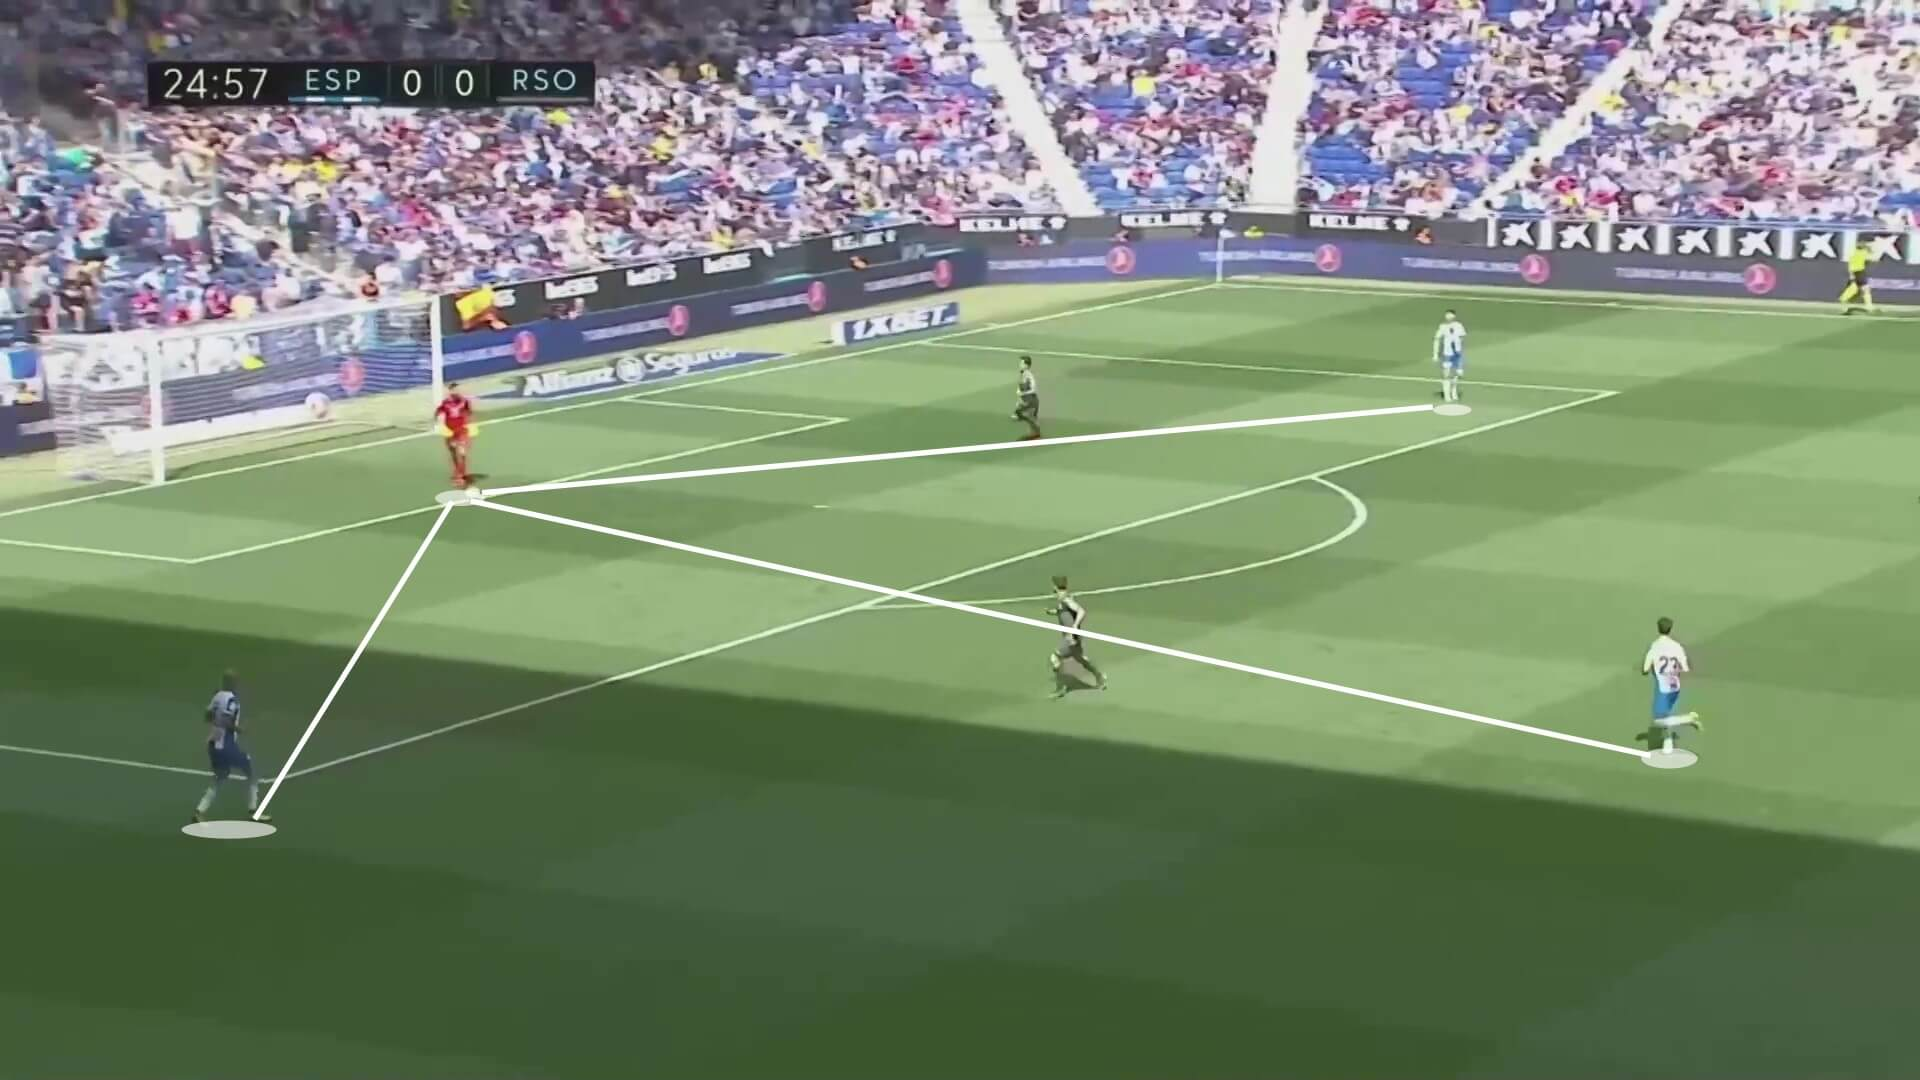 Mario Hermoso 2018/19 scout report tactical analysis tactics 1